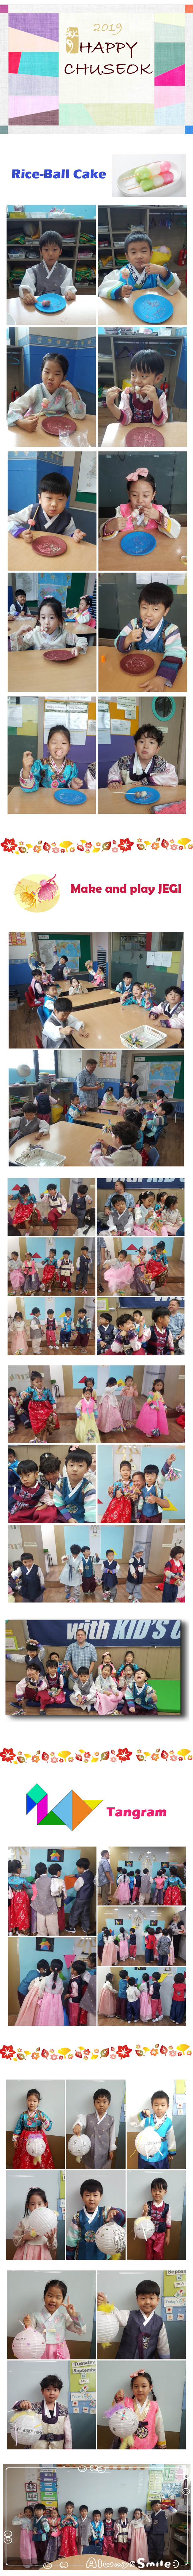 2019_Chuseok_Walnut copy.jpg